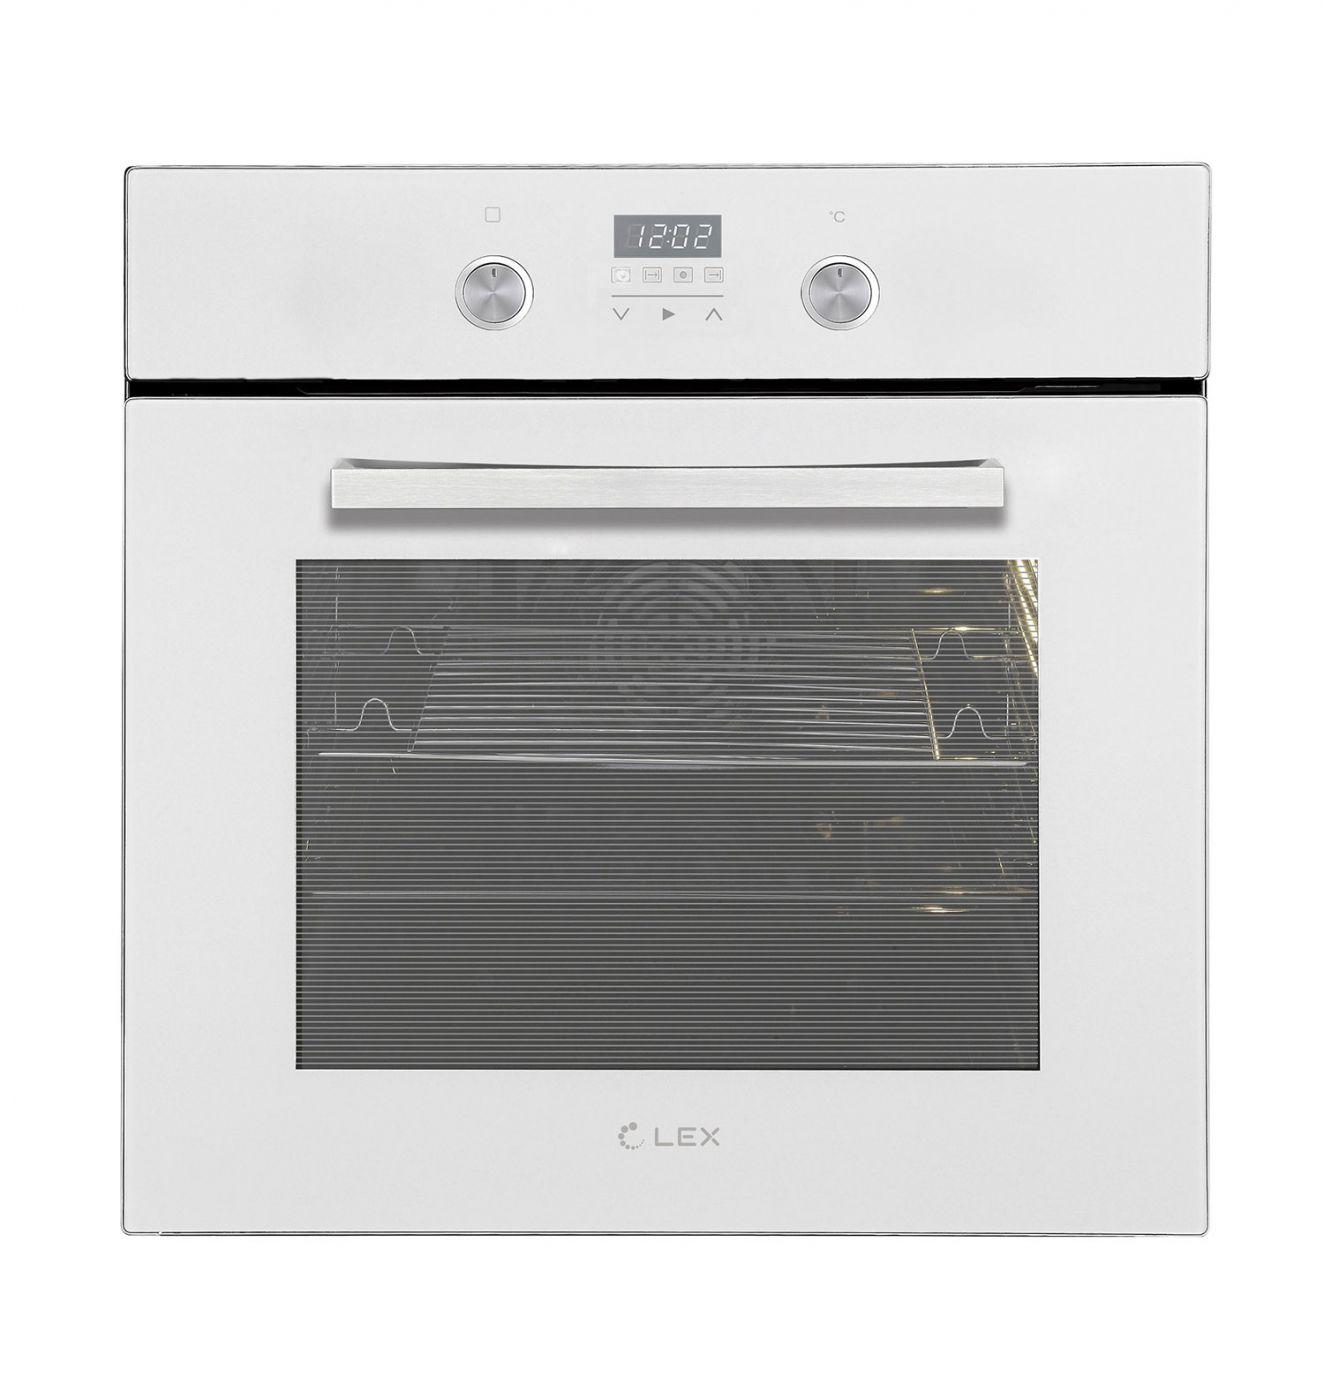 Электрический духовой шкаф LEX EDP 093 WH NEW (CHAO000317)